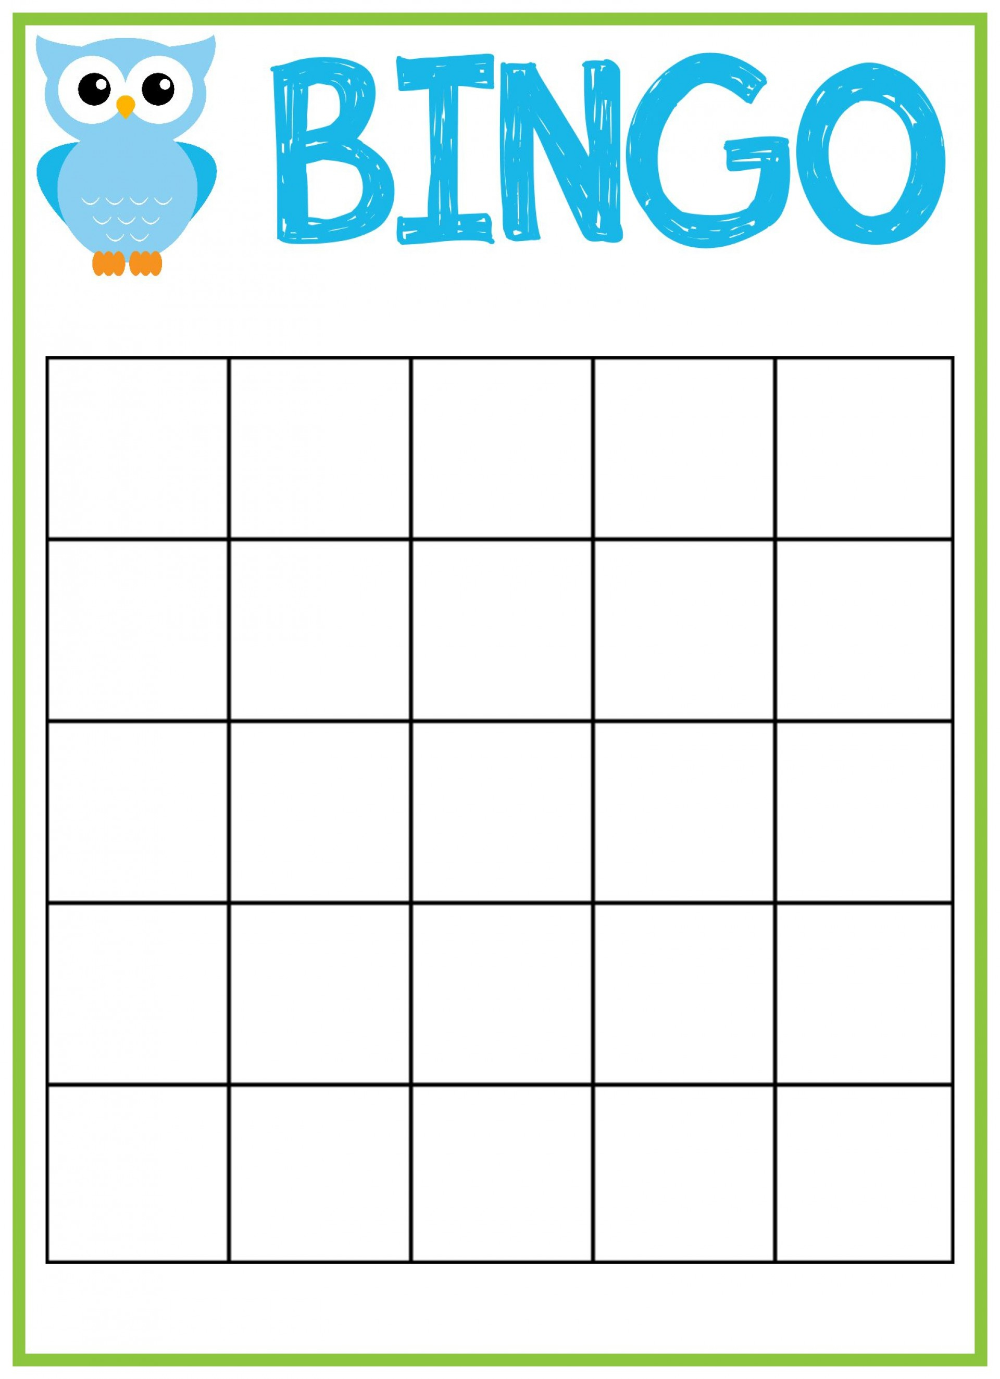 038 free printable cards word blank bingo awesome card